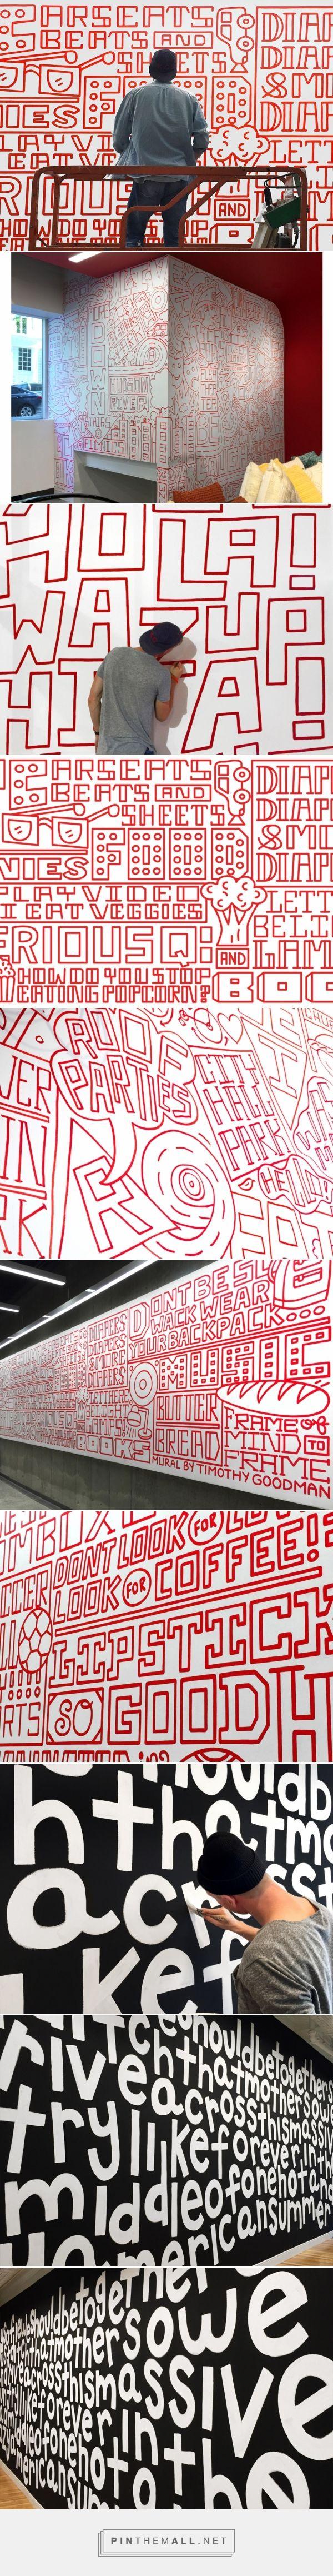 Timothy Goodman's new playful hand-painted typographic murals | Creative Boom - created via https://pinthemall.net